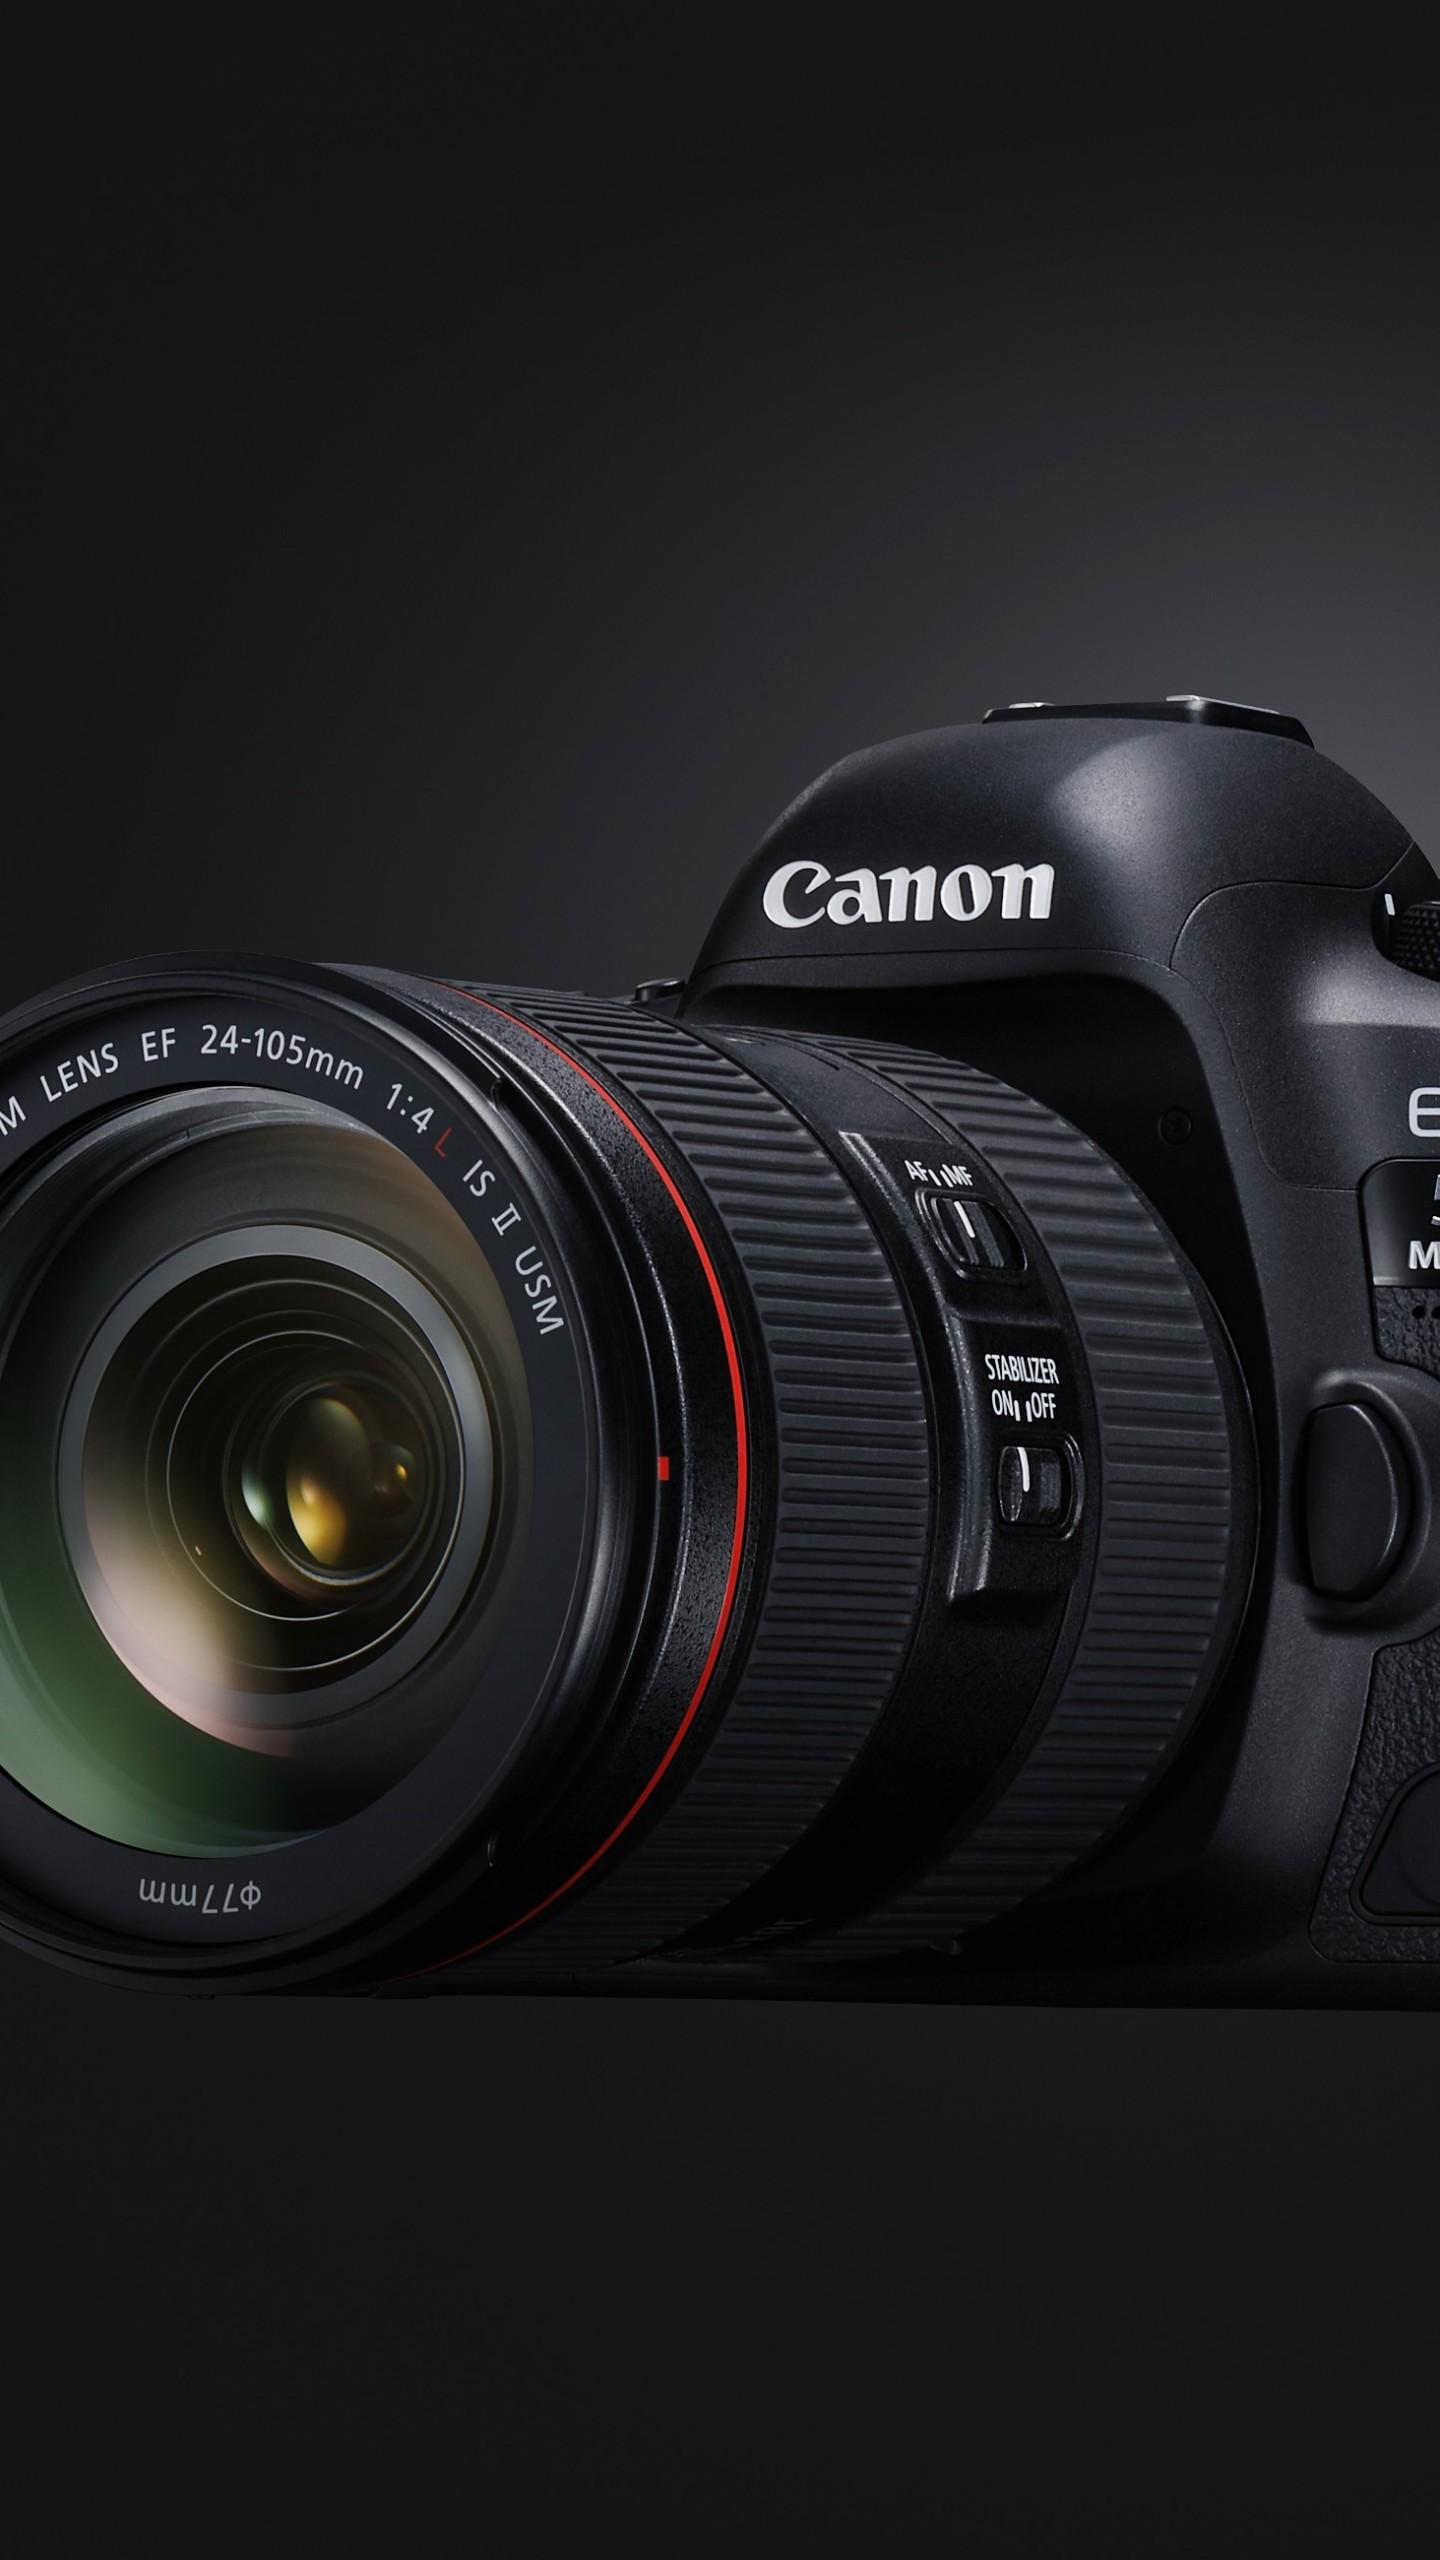 Cool Cars Games >> Wallpaper Canon EOS 5D Mark IV, Photokina 2016, 4k, review ...